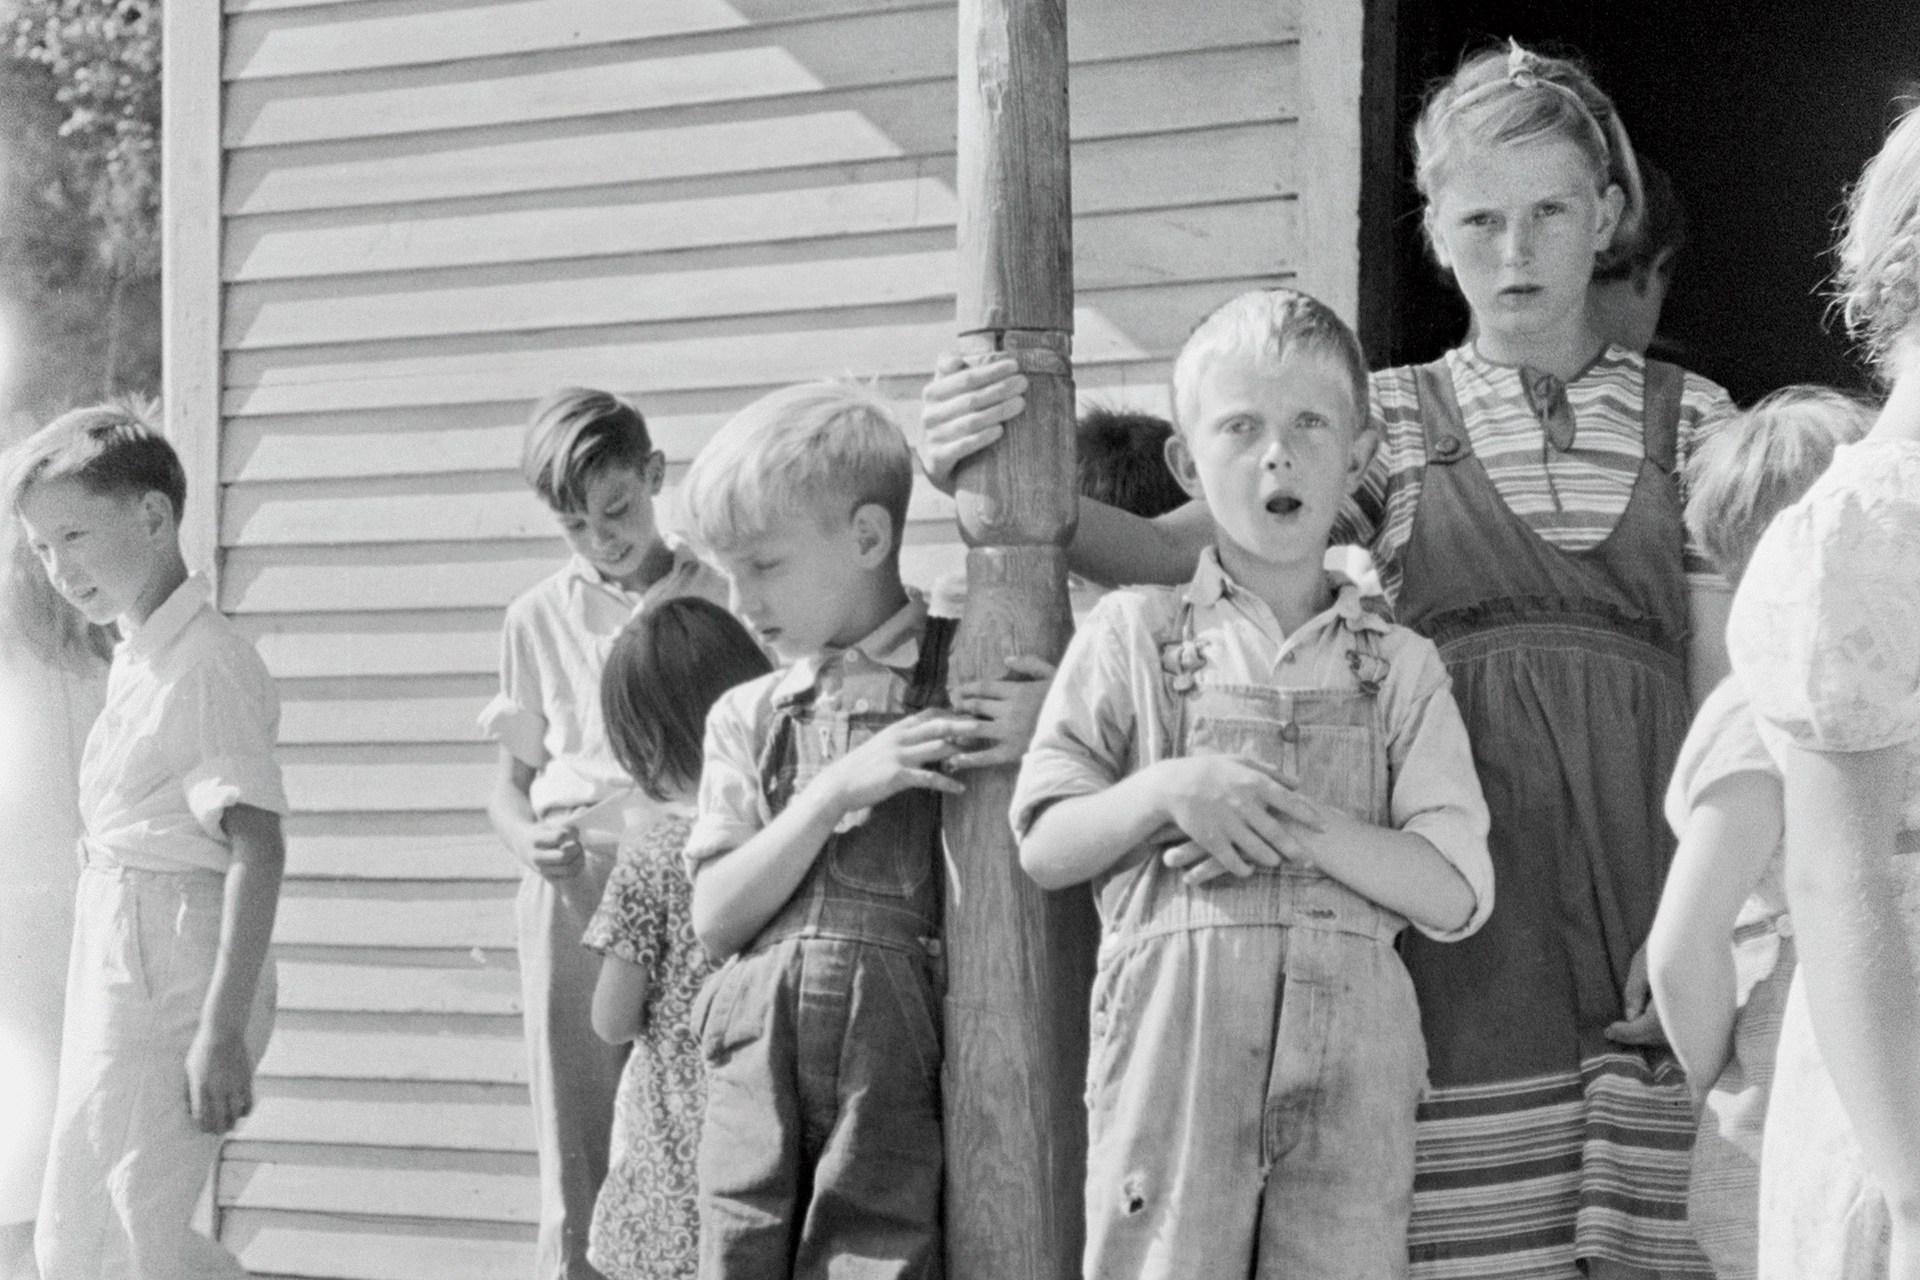 The Despair Of Poor White Americans